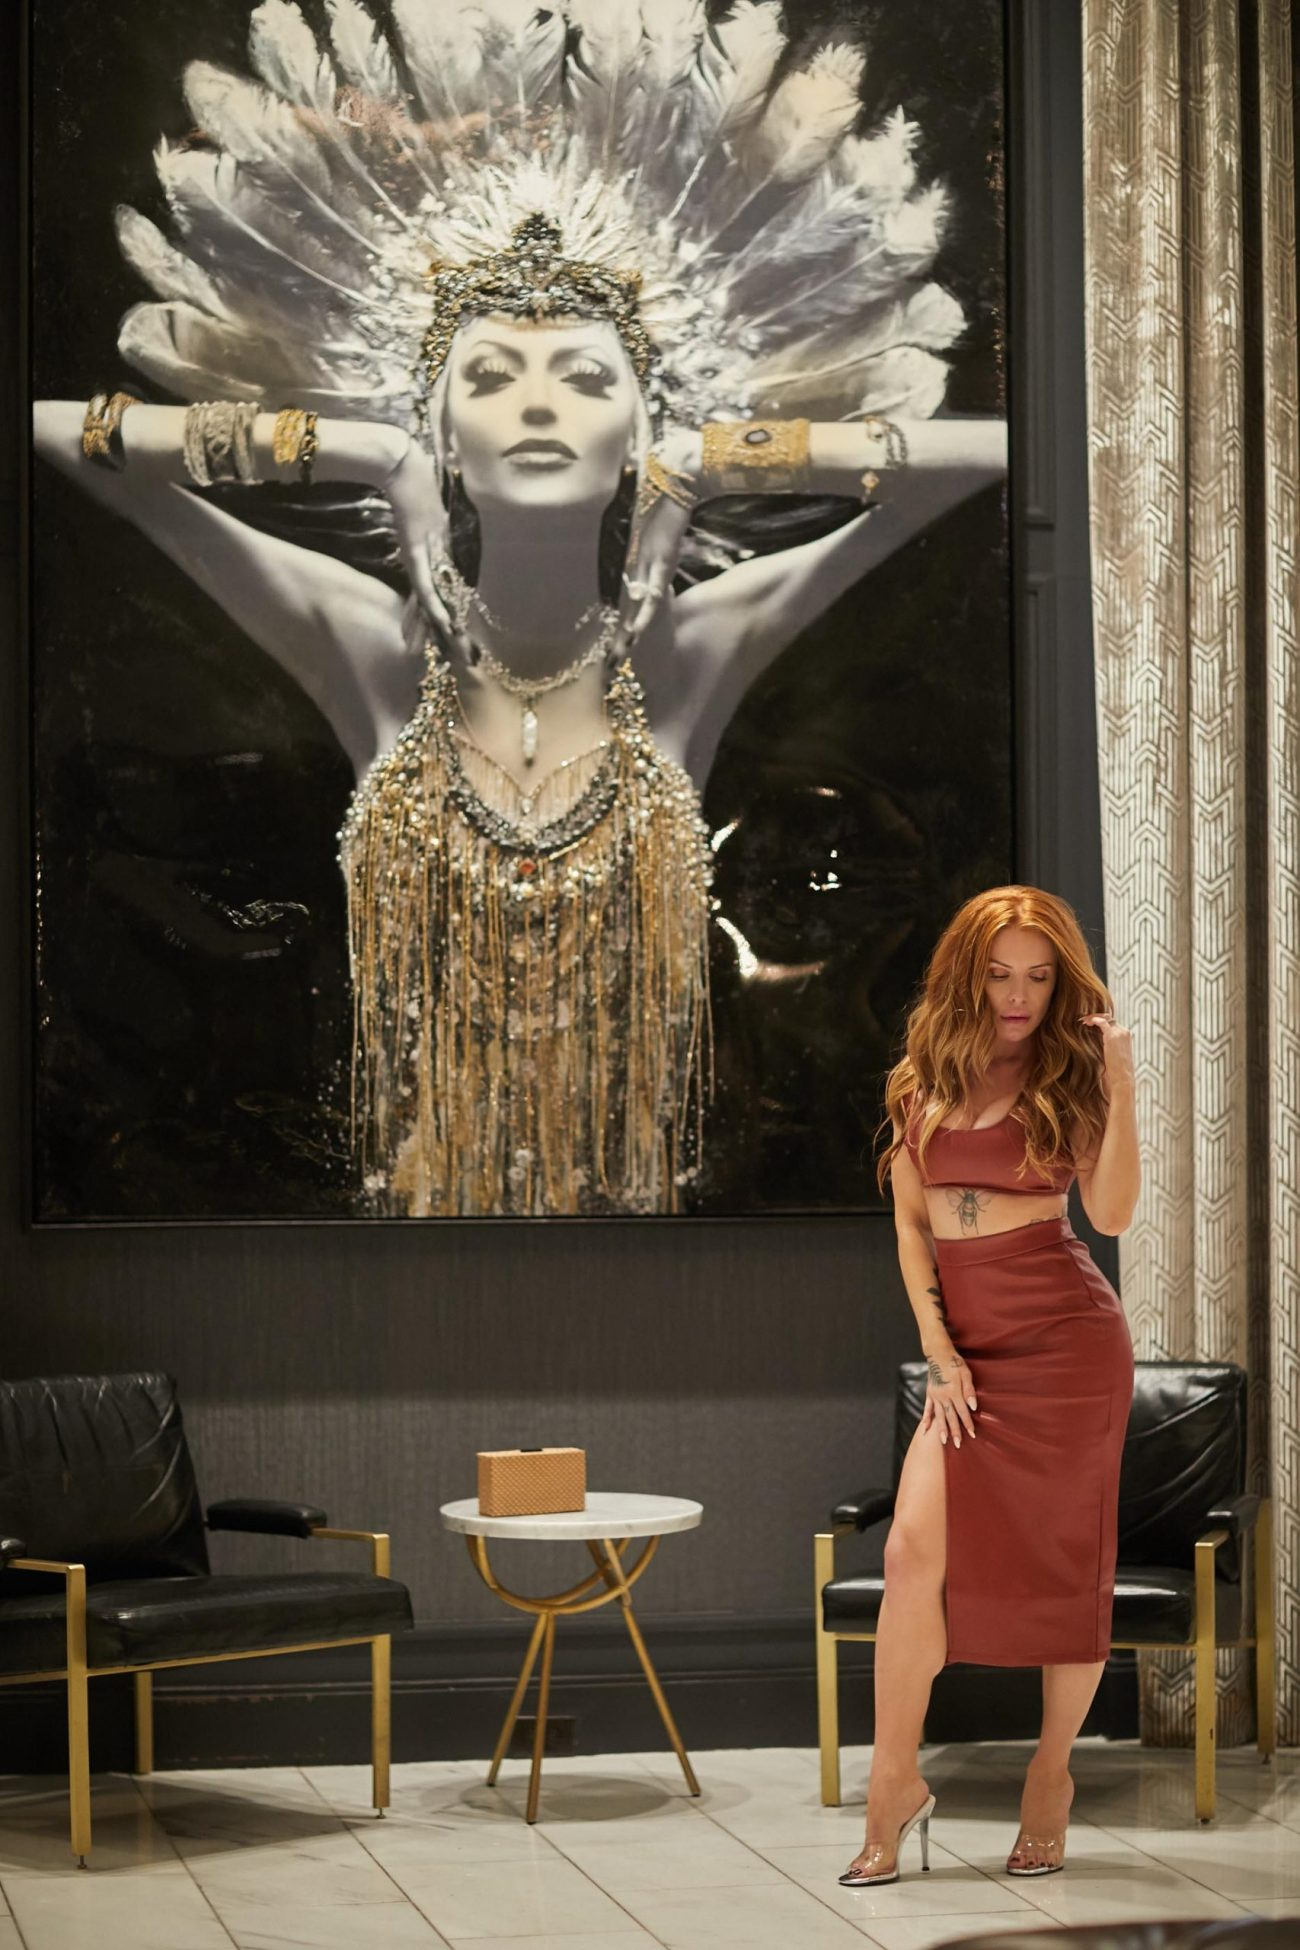 chicago boudoir hotel sexy photos elegant scaled - Listing E